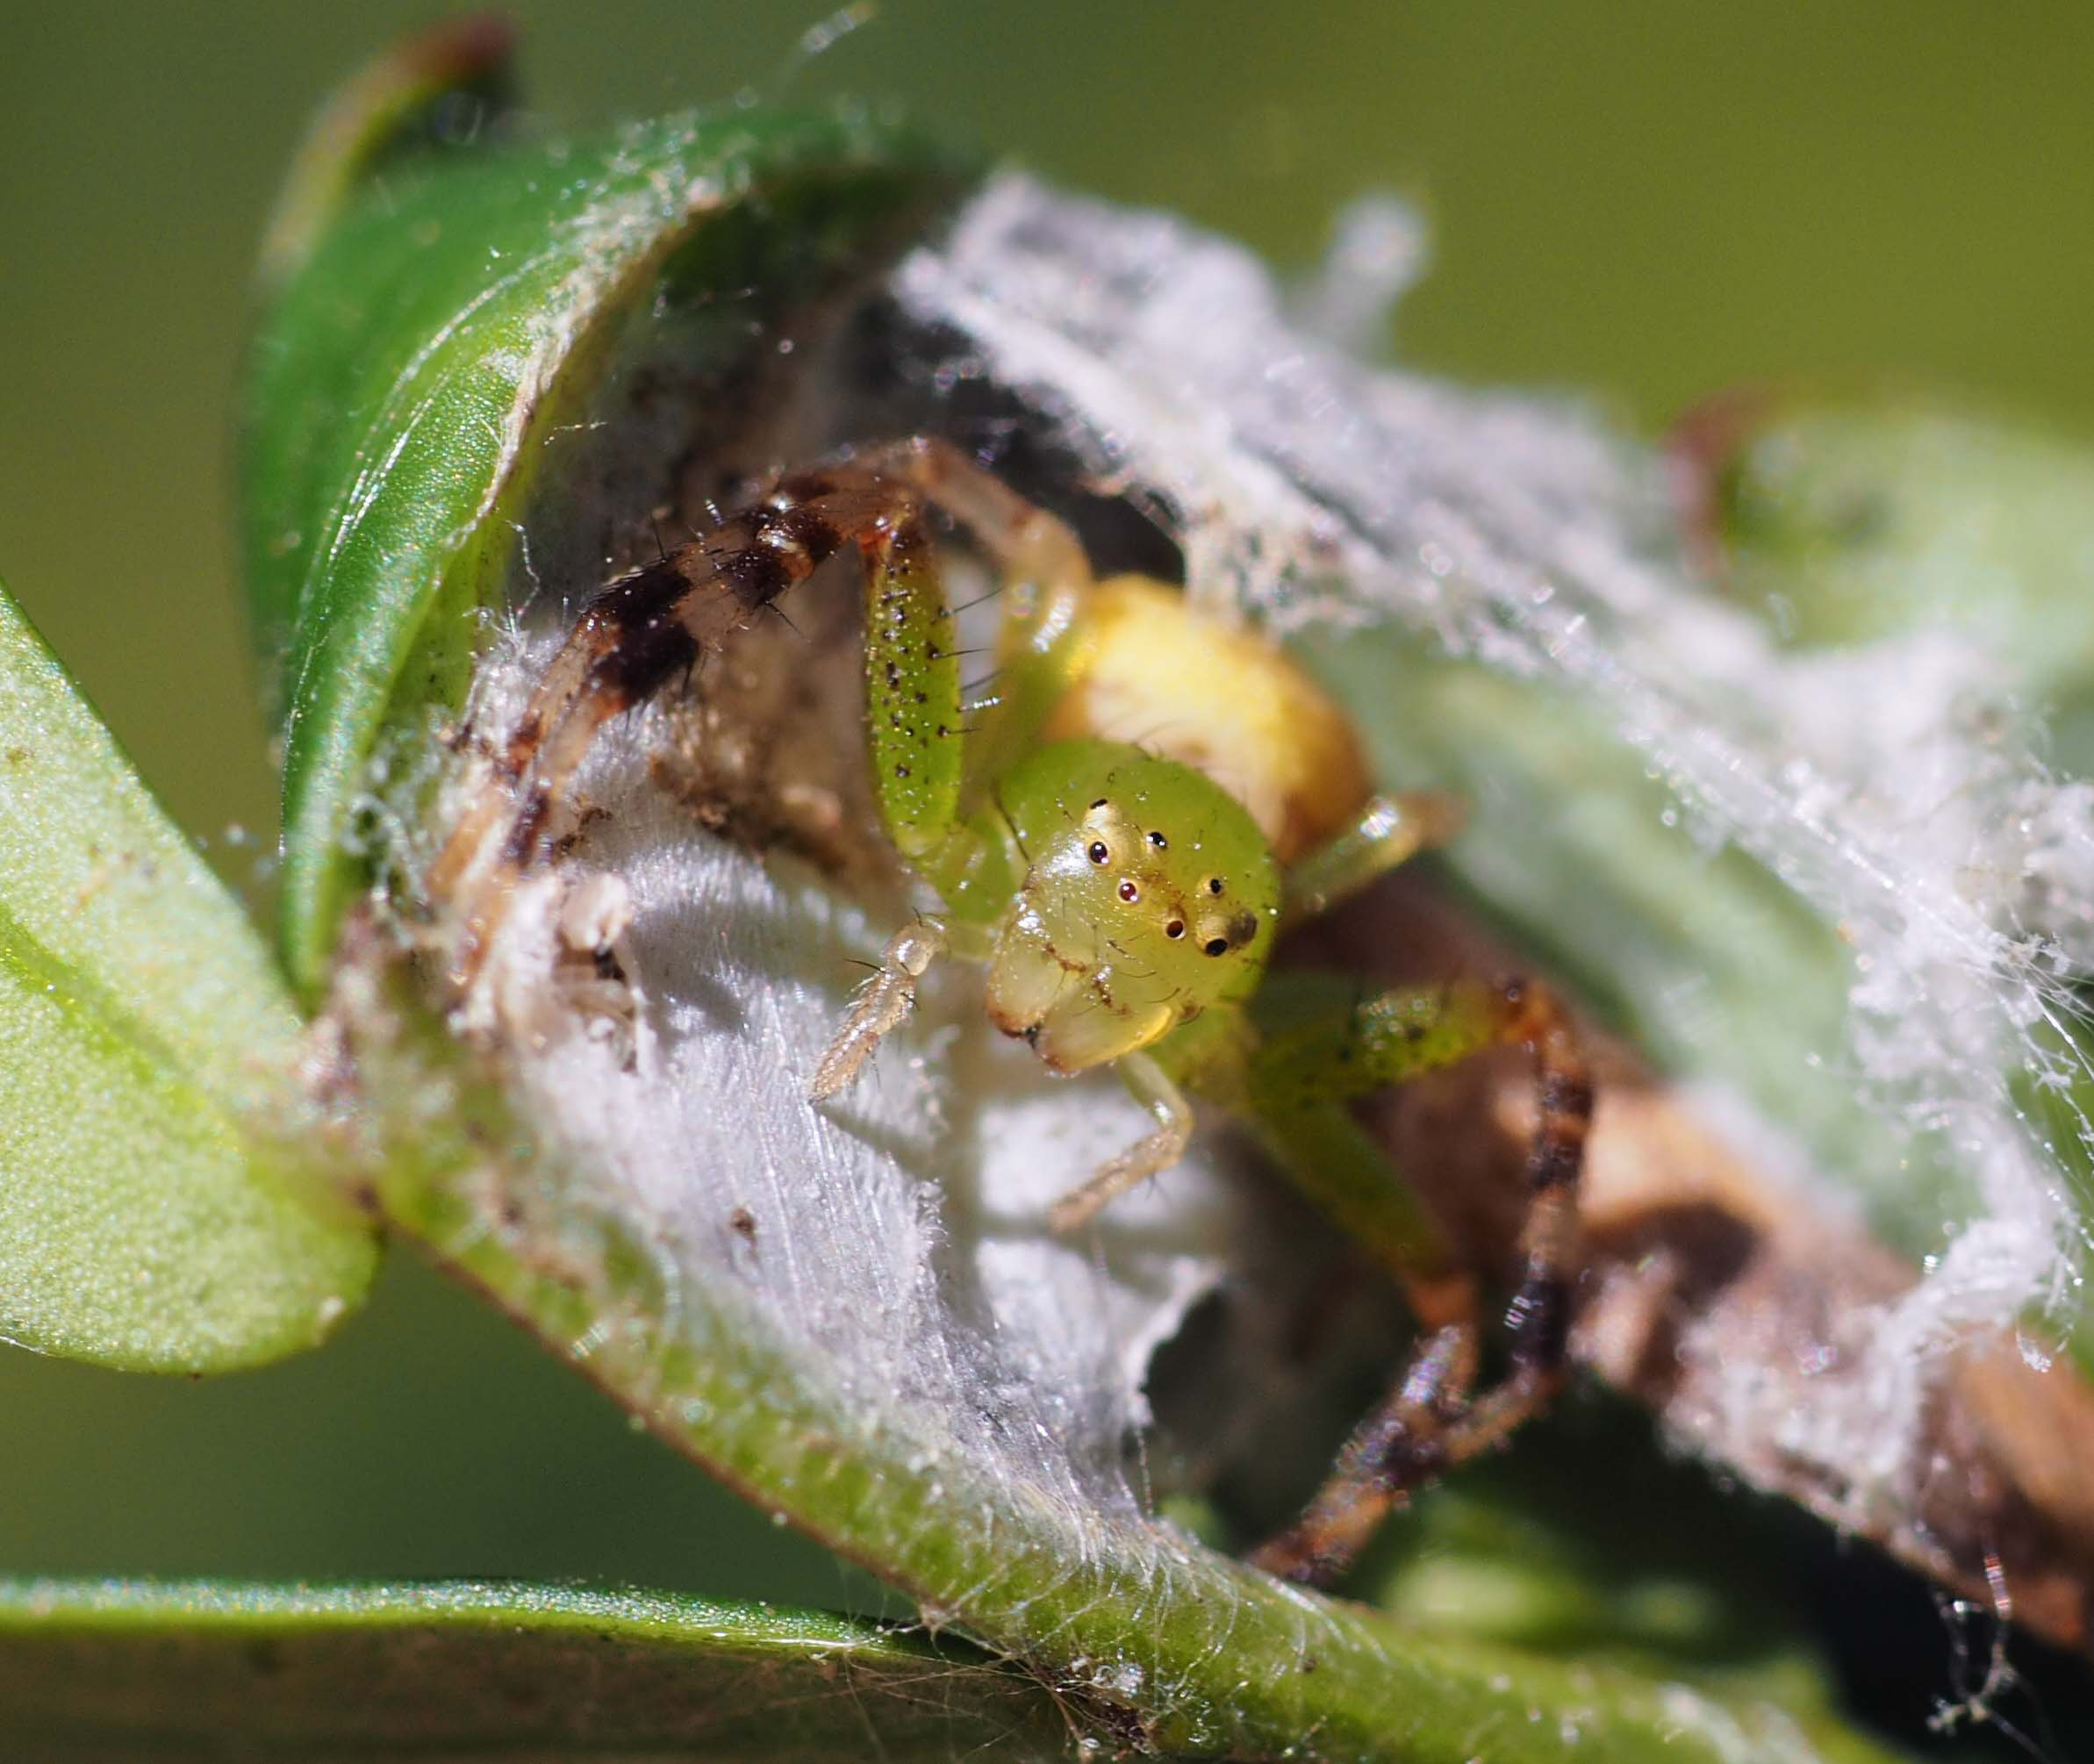 Lozenge-shaped Flower Spider (female)